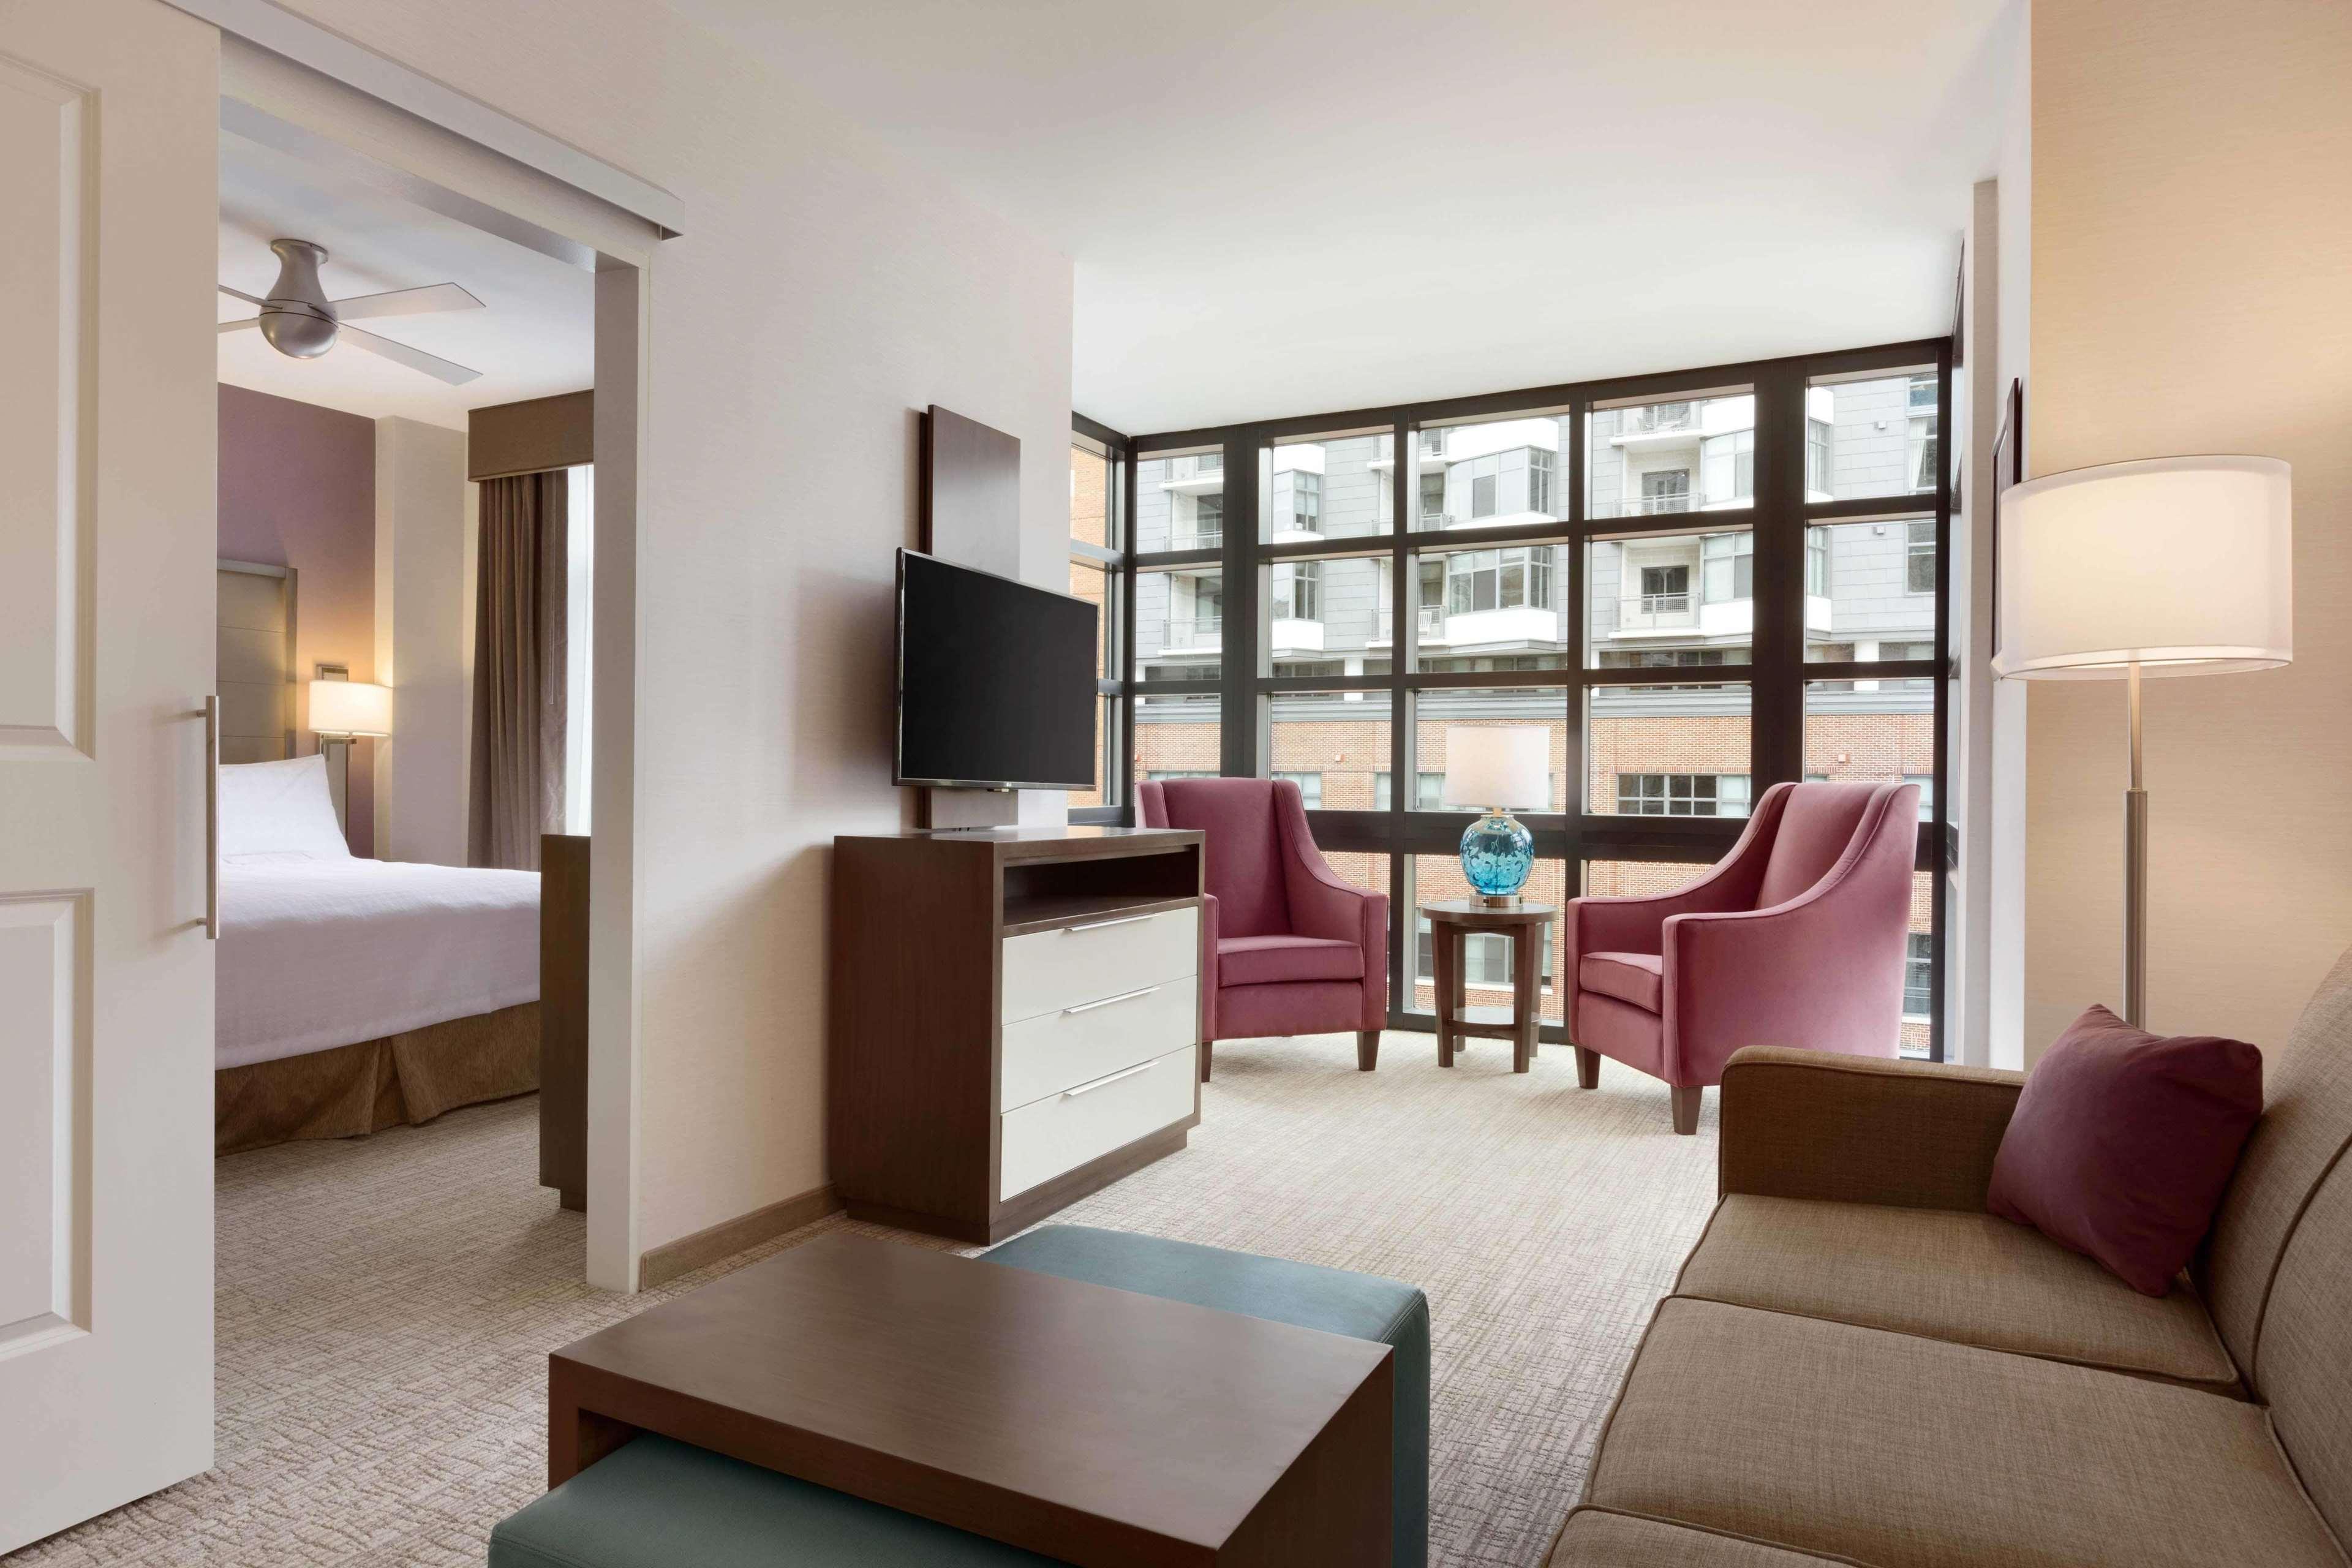 Homewood Suites by Hilton Washington DC Convention Center image 31